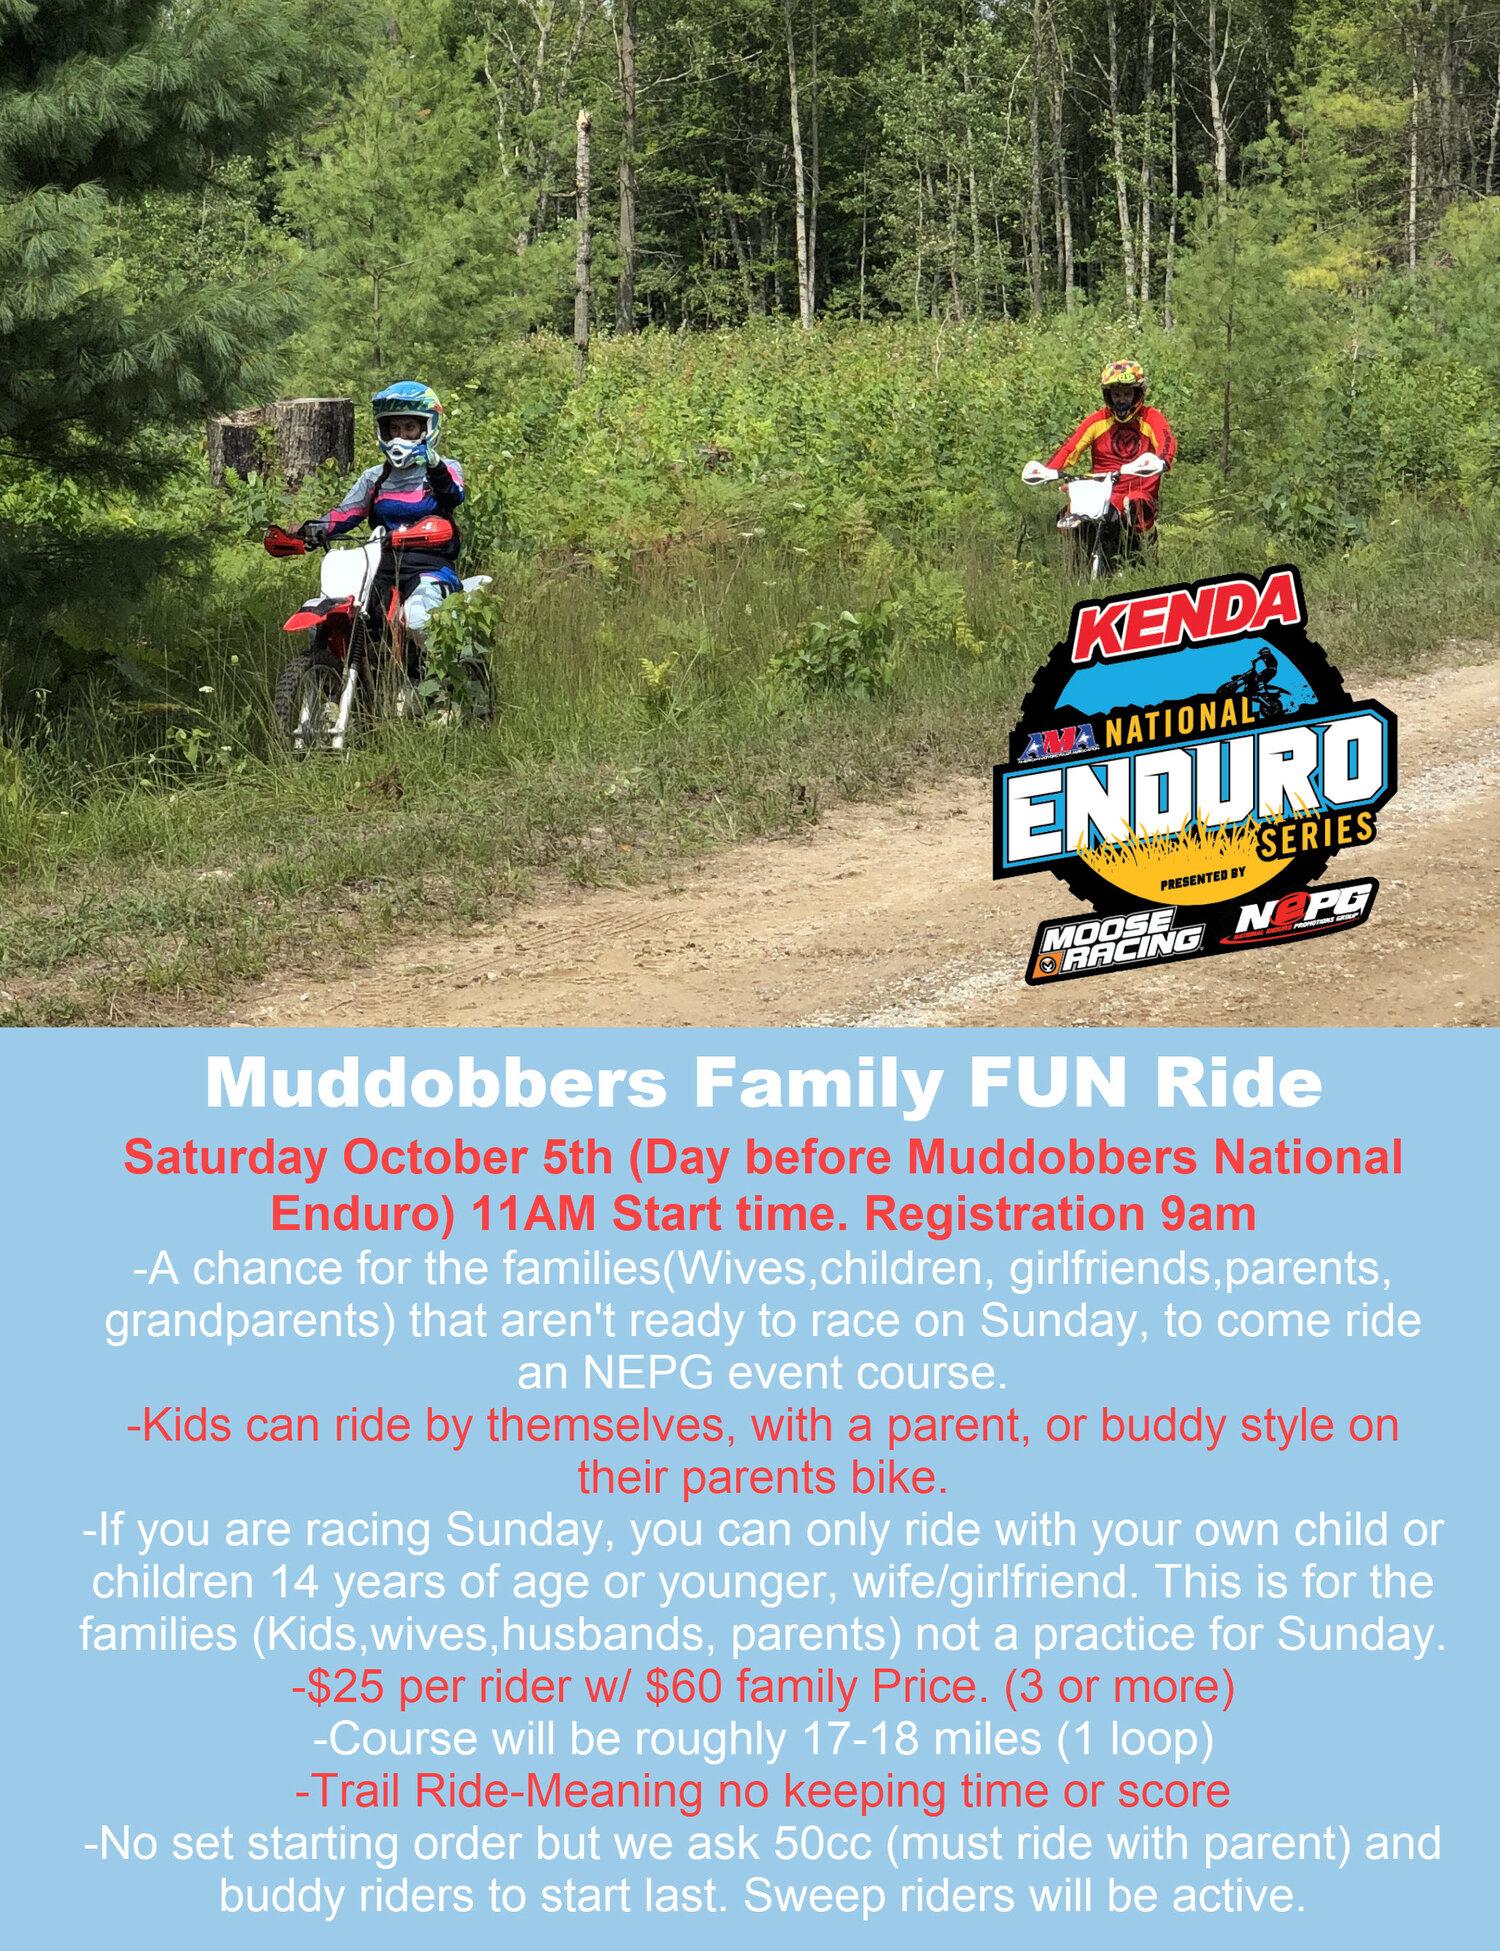 muddobbers+familiy+fun